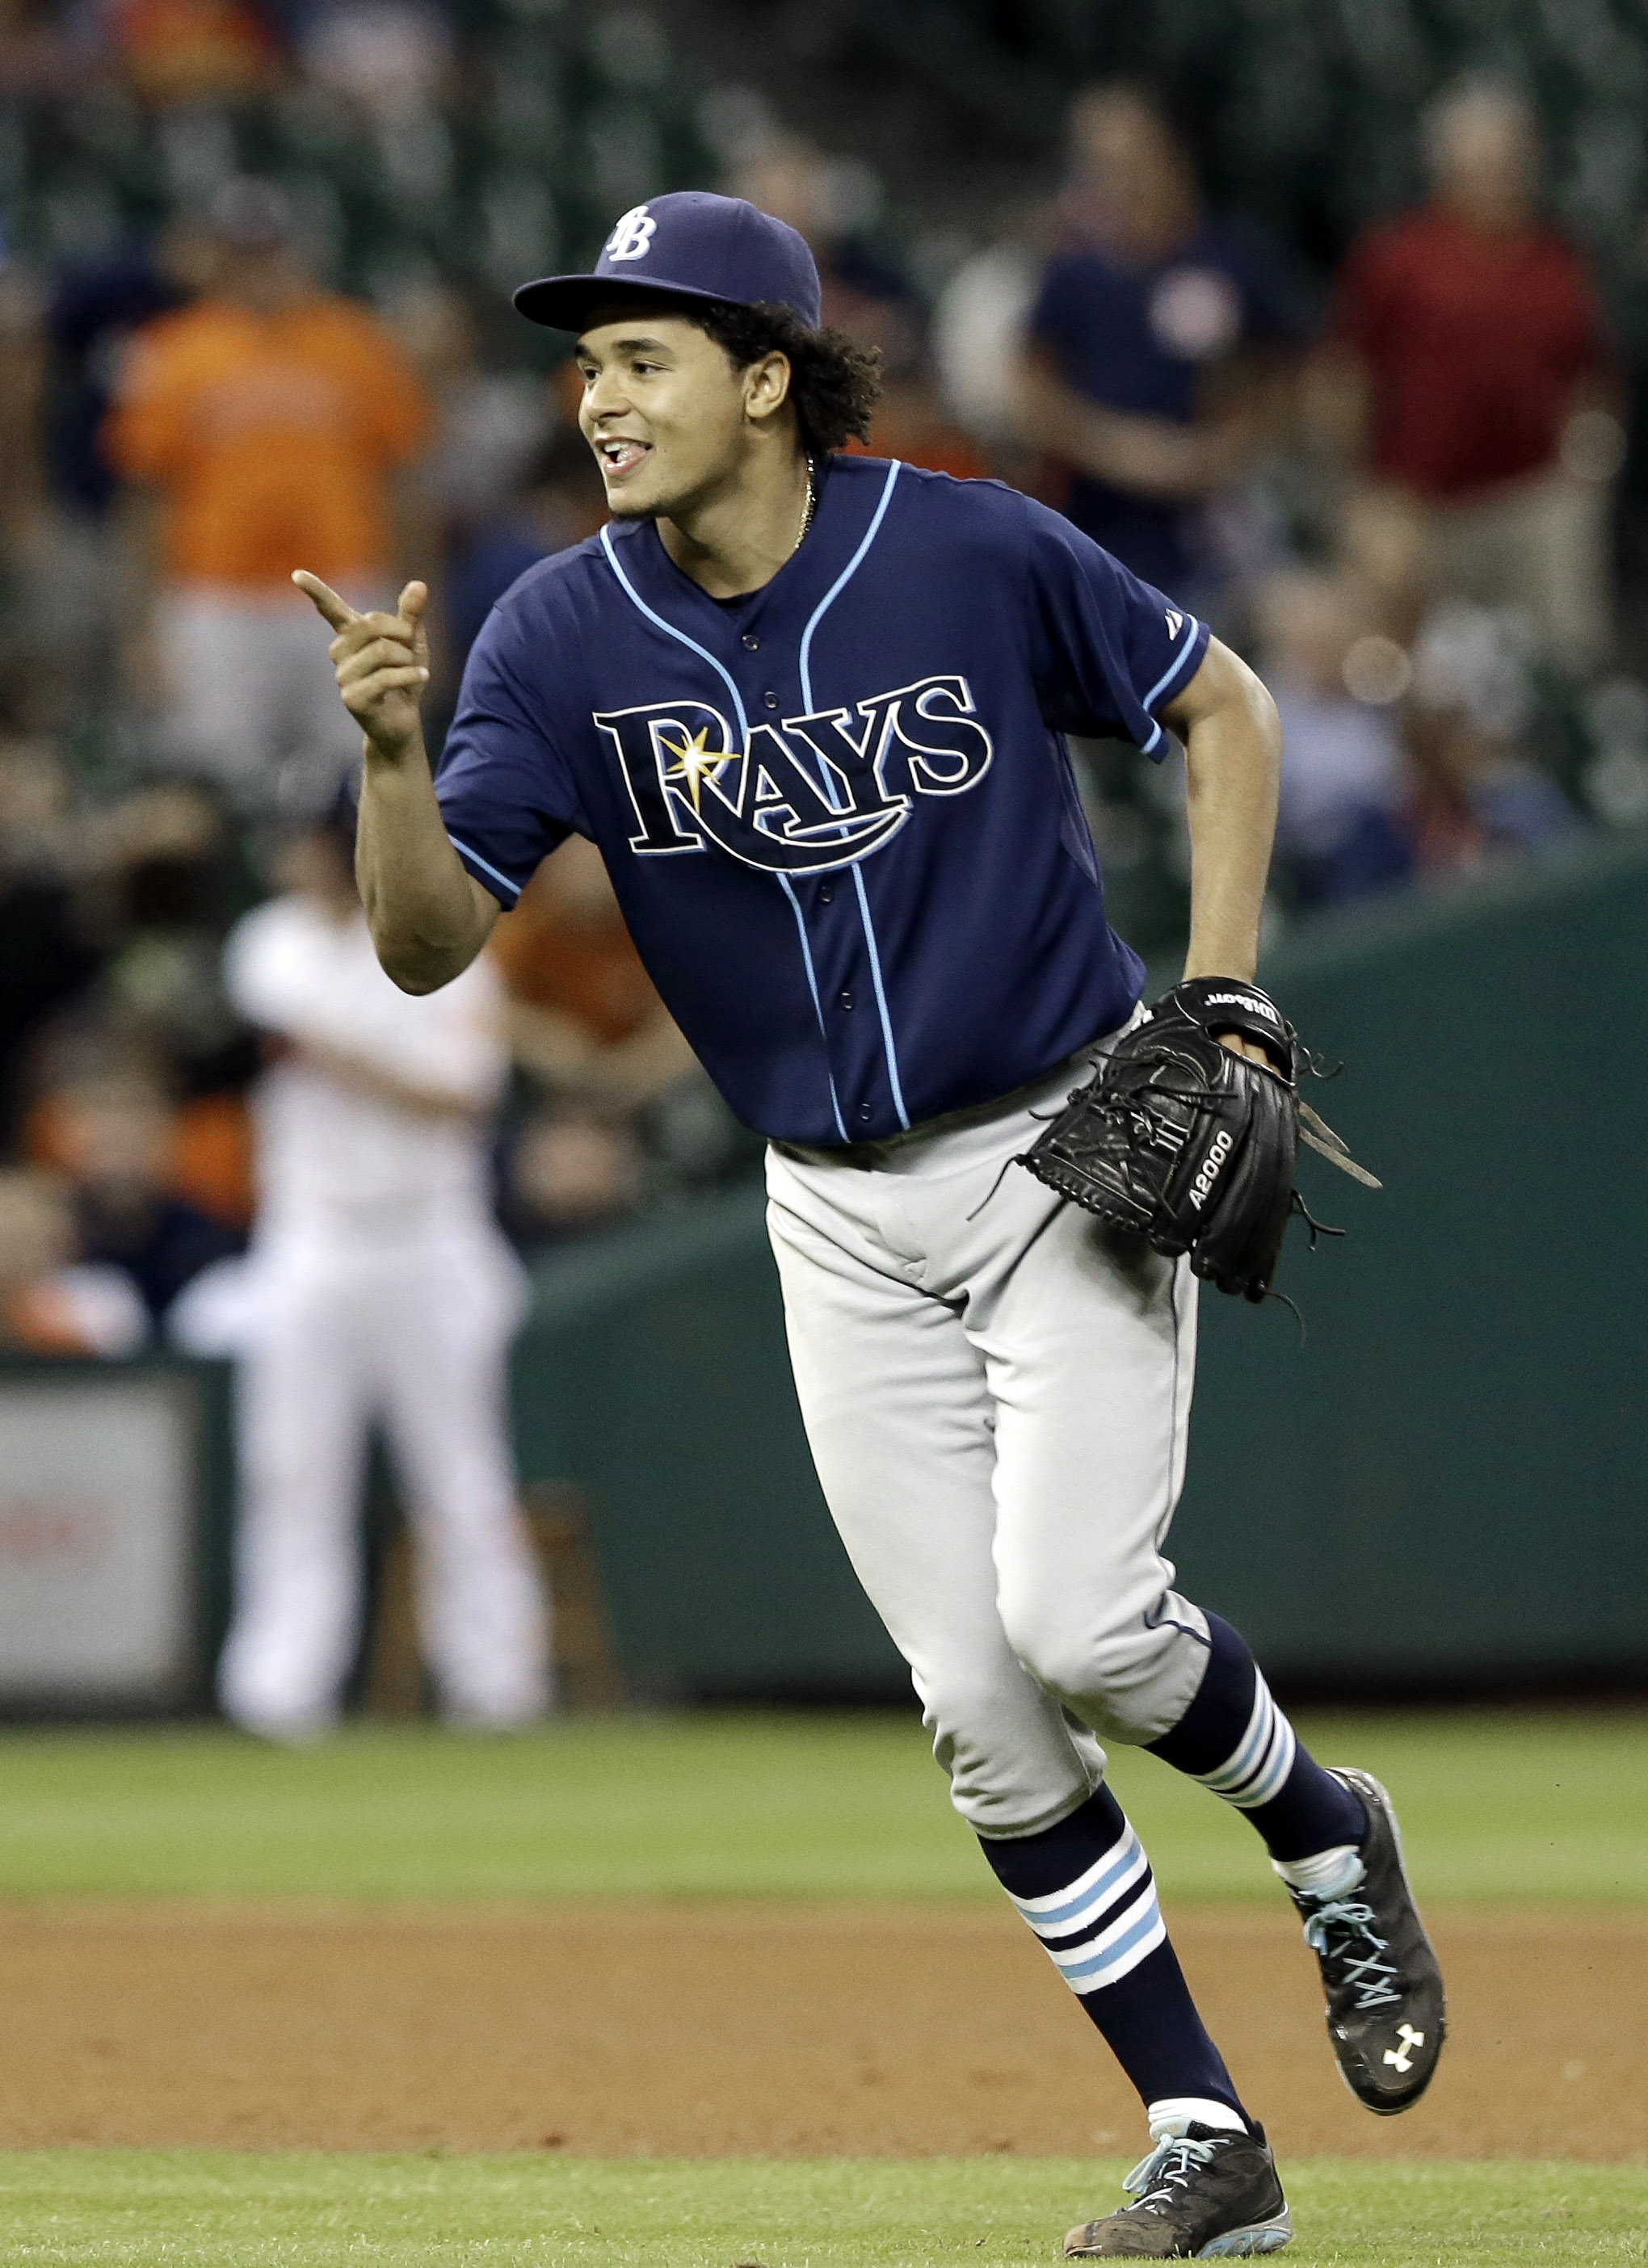 Tampa Bay Rays' Chris Archer celebrates his one-hit complete baseball game to beat the the Houston Astros 1-0, Thursday, Aug. 20, 2015, in Houston. (AP Photo/Pat Sullivan)